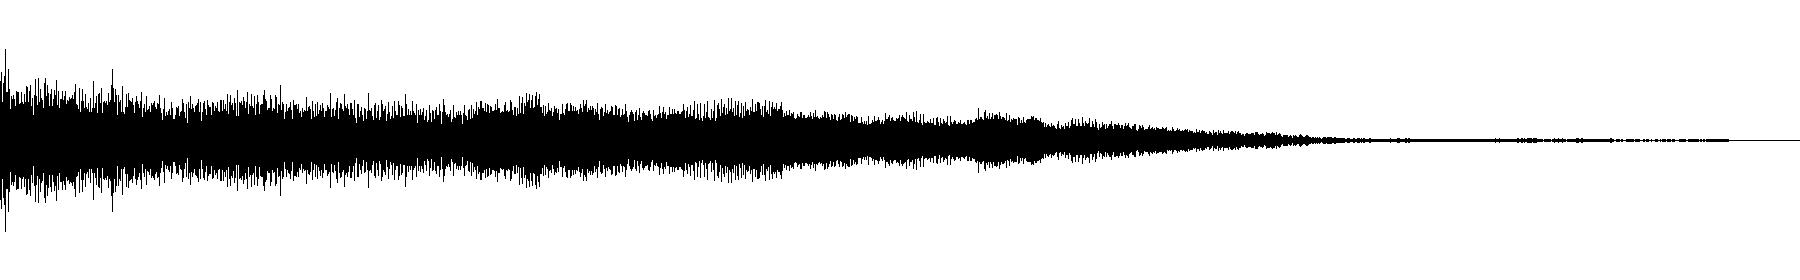 flutyflu